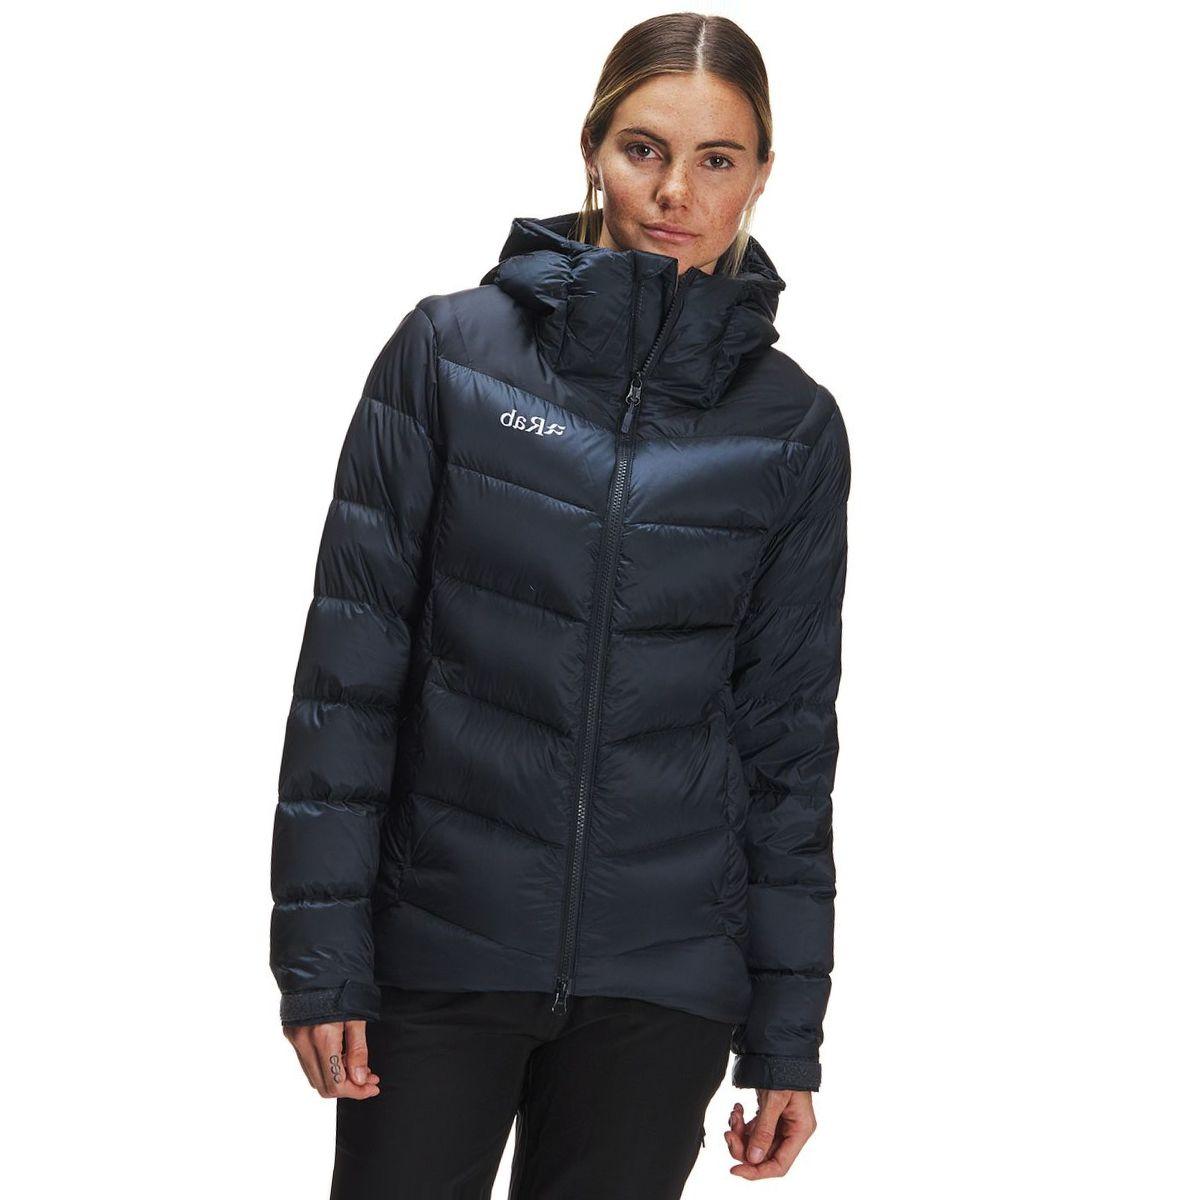 Rab Neutrino Pro Down Jacket - Women's